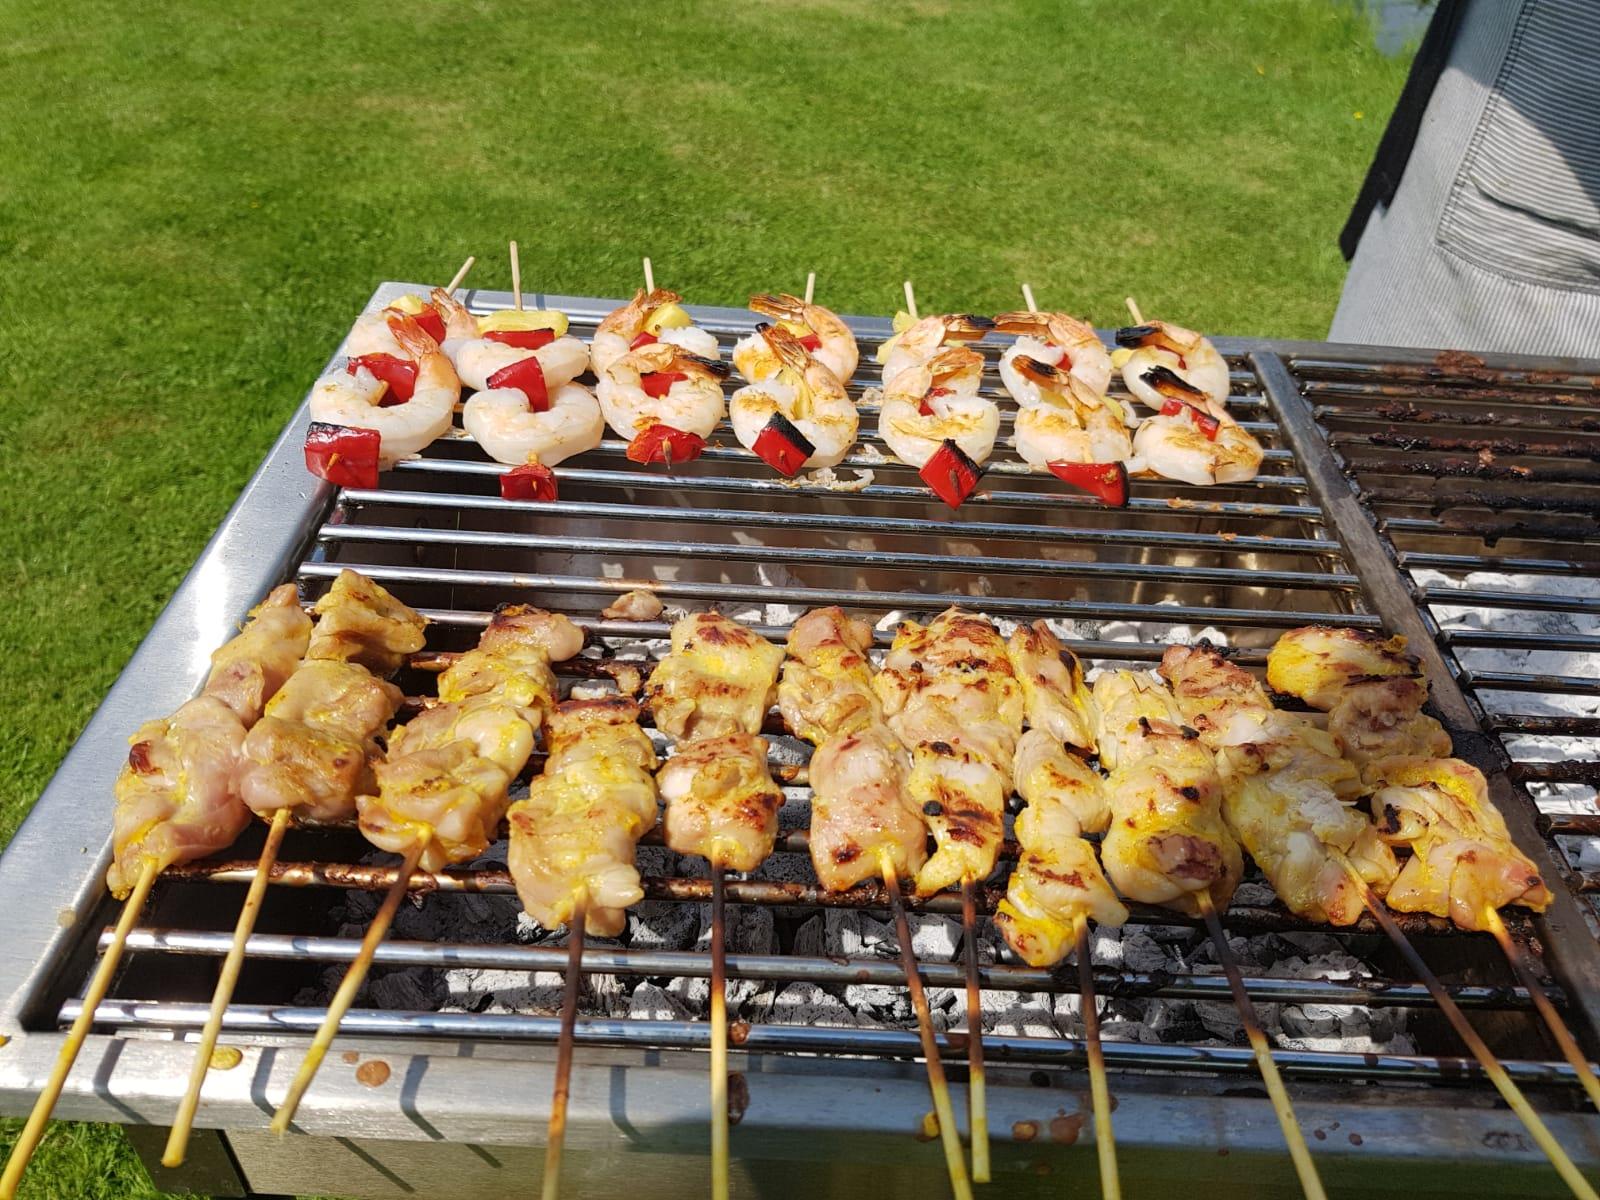 Satays / Prawns On the BBQ